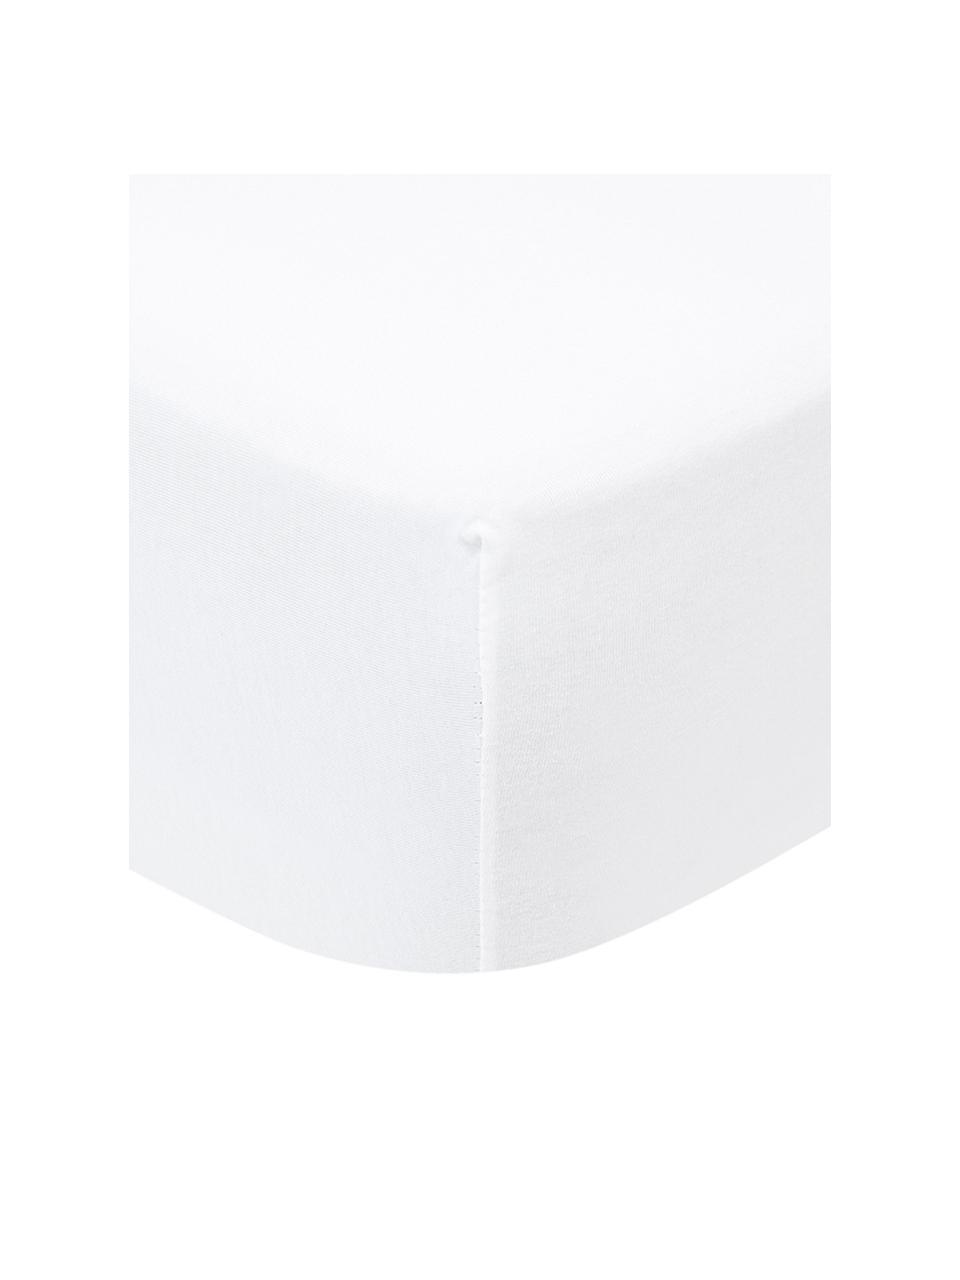 Sábana bajera para boxspring de jersey con elastano Lara, 95%algodón, 5%elastano, Blanco, Cama 180 cm (180 x 200 cm)